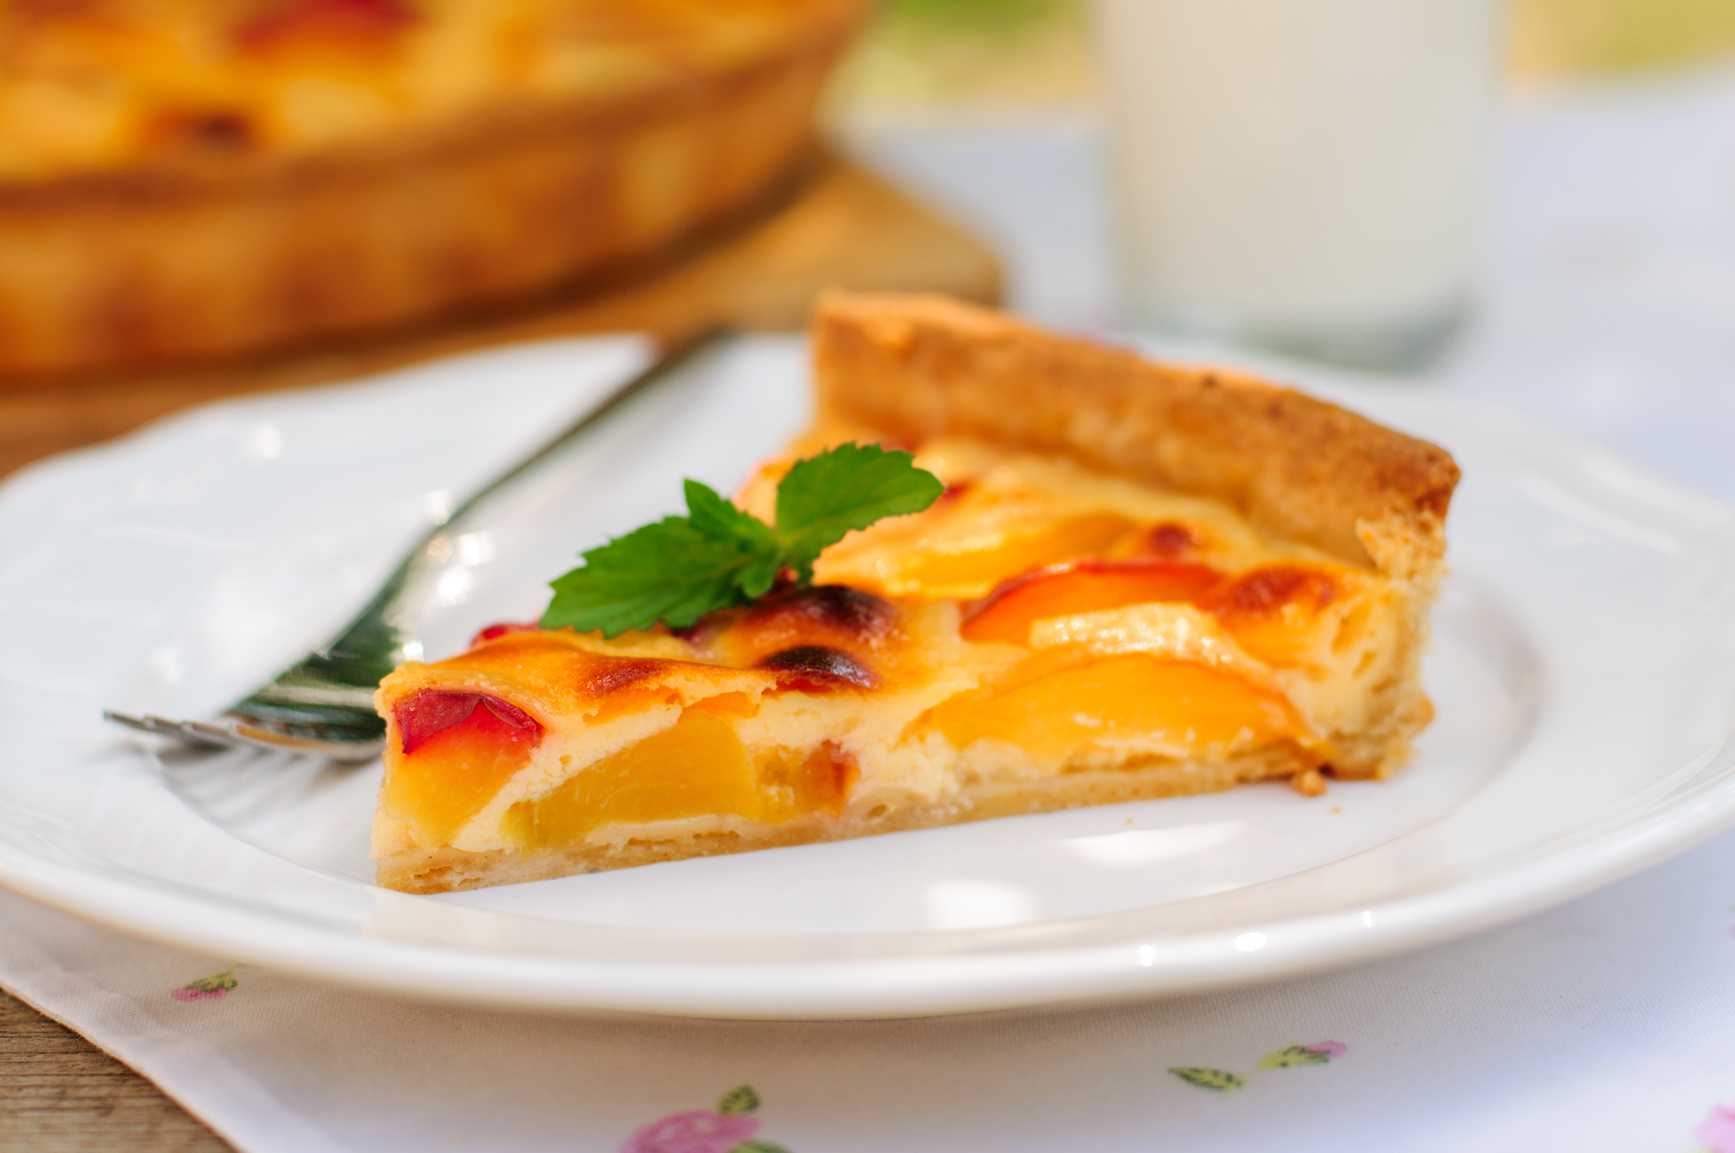 A Slice of Peach and Sour Cream Custard Pie